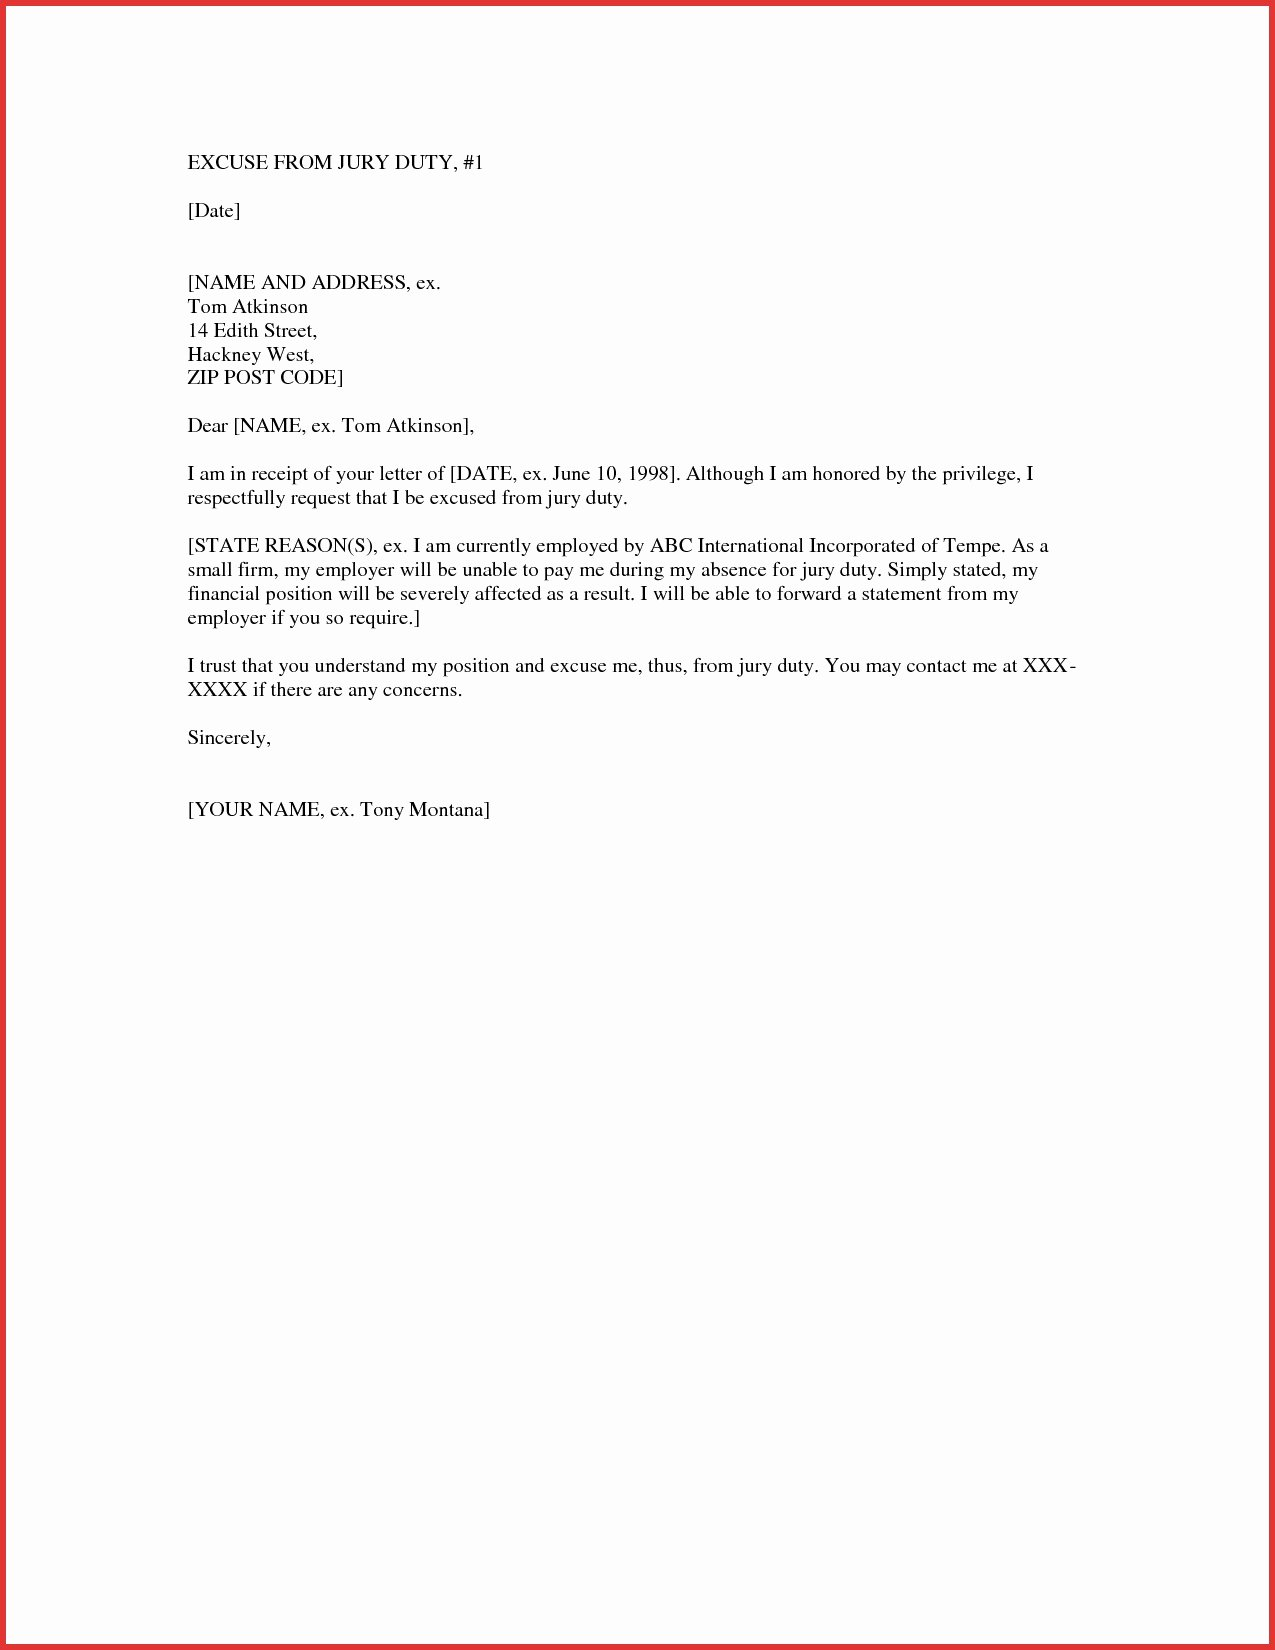 Jury Duty Excuse Letter Employer Unique 9 Example Of Jury Duty Excuse Letter